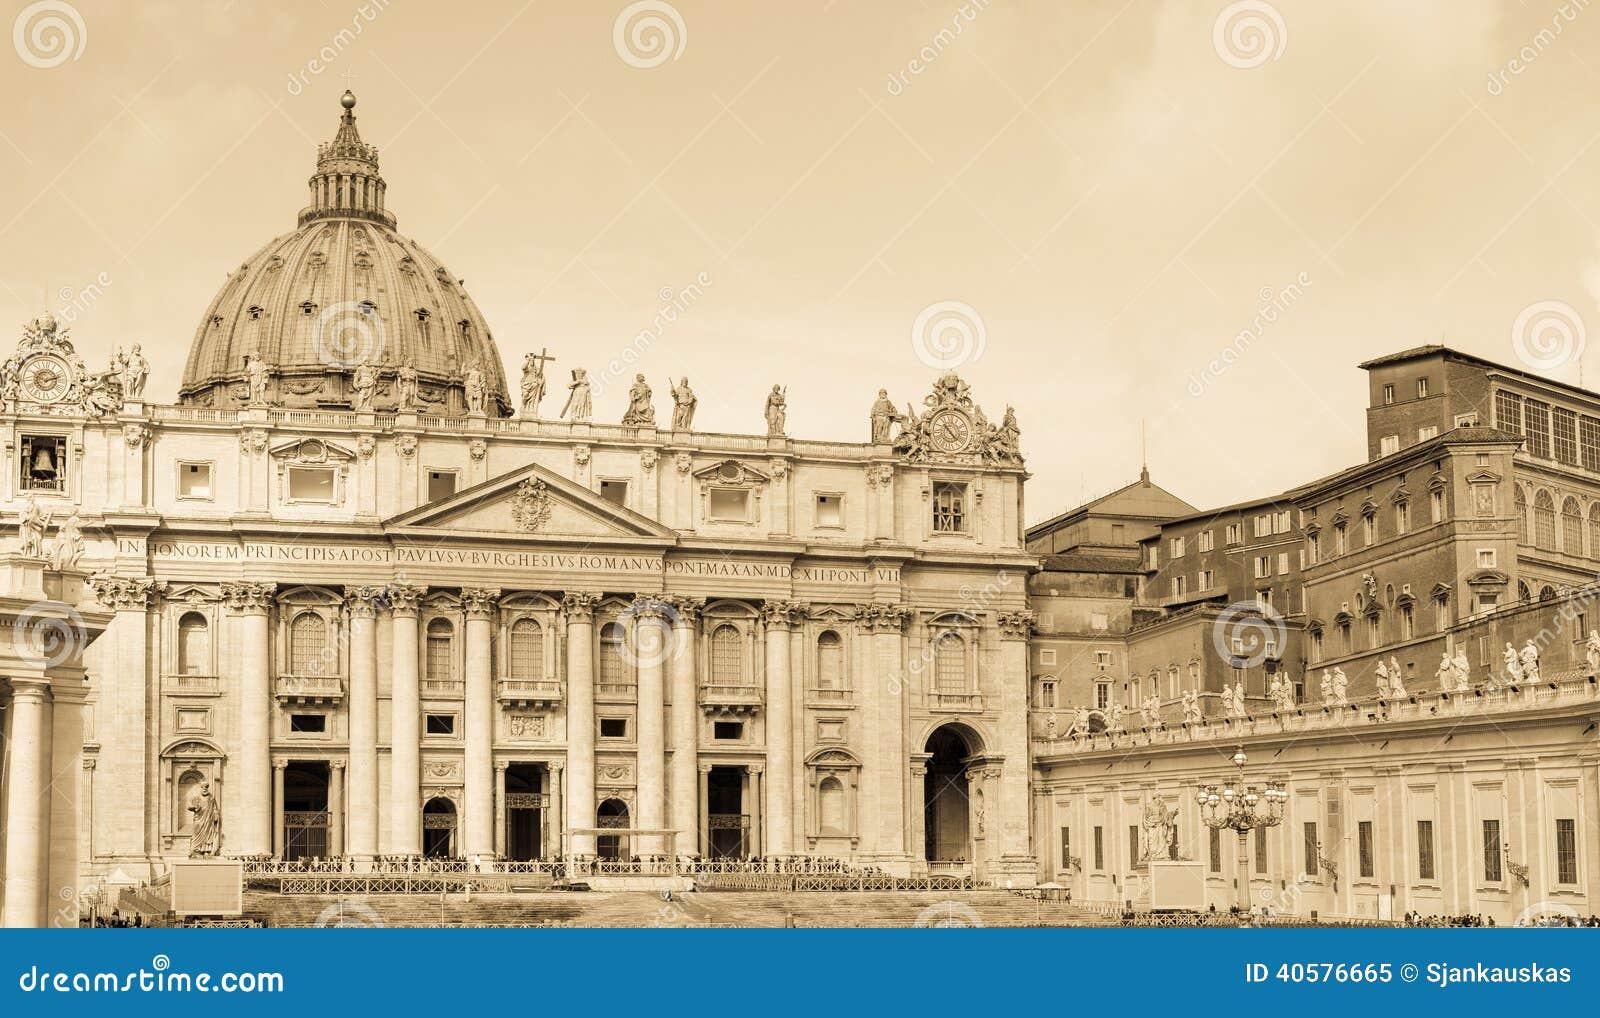 Базилика St Peters, Ватикан, постаретое фото